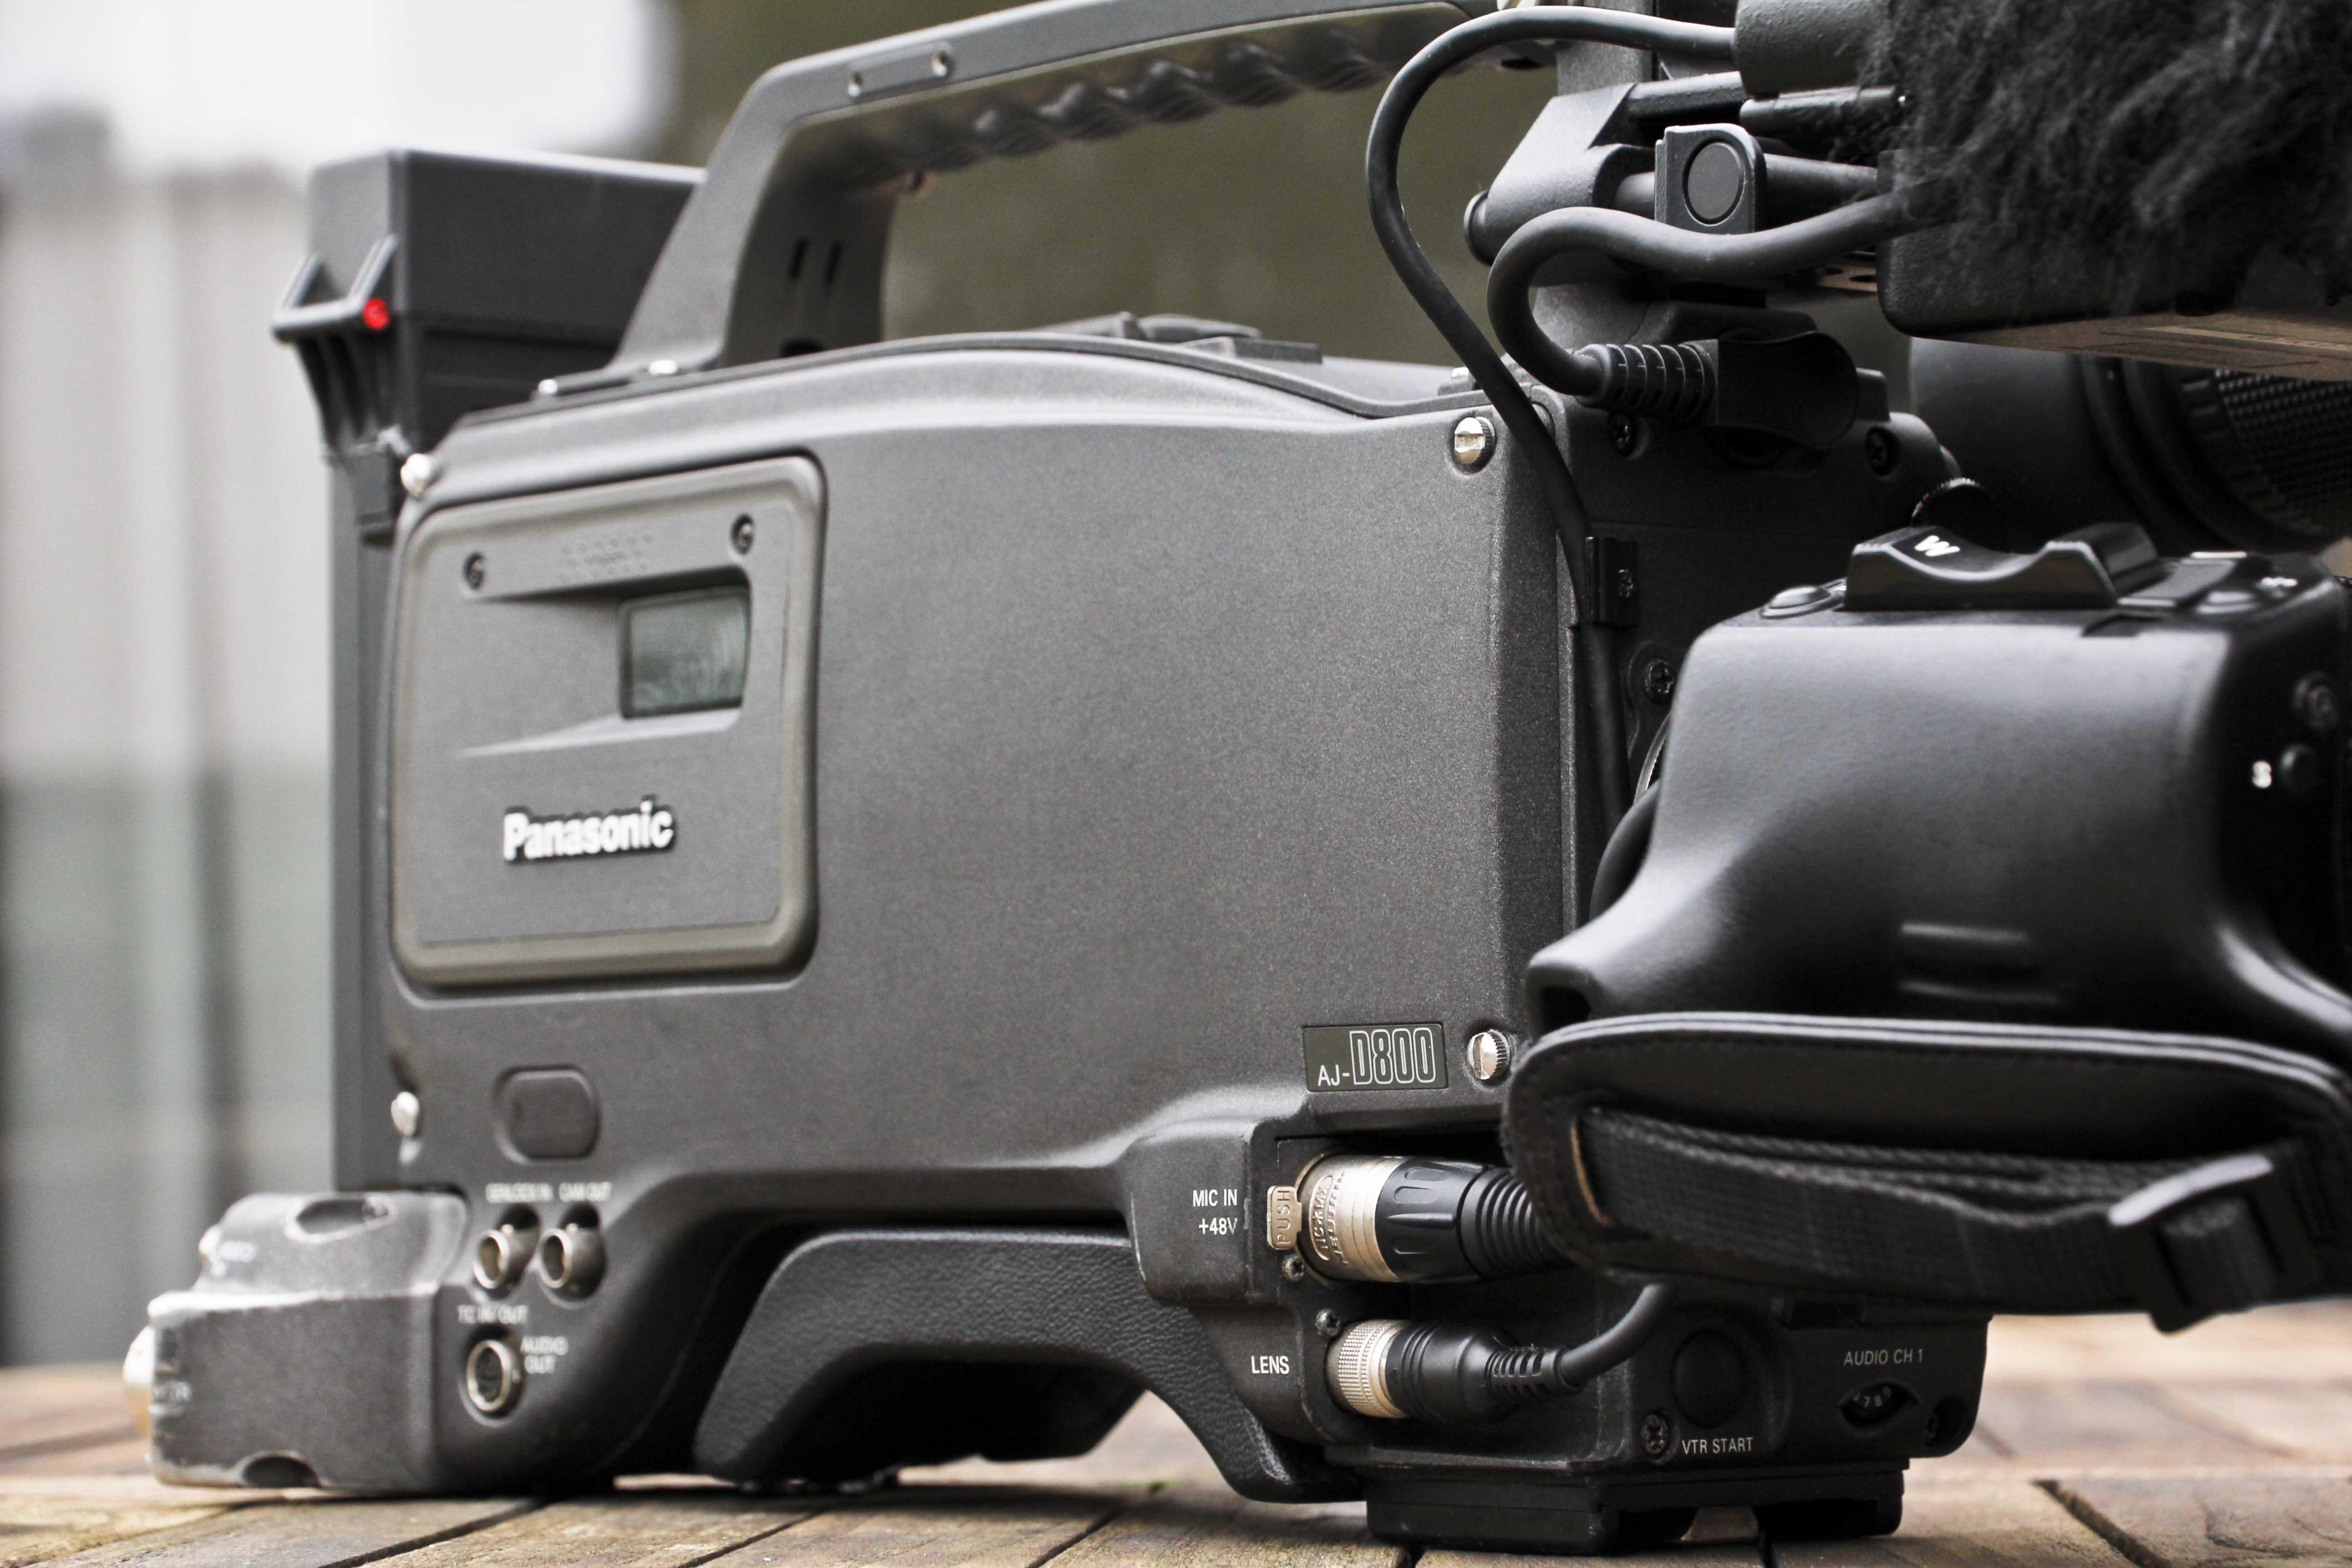 Panasonic AJD-800E -5